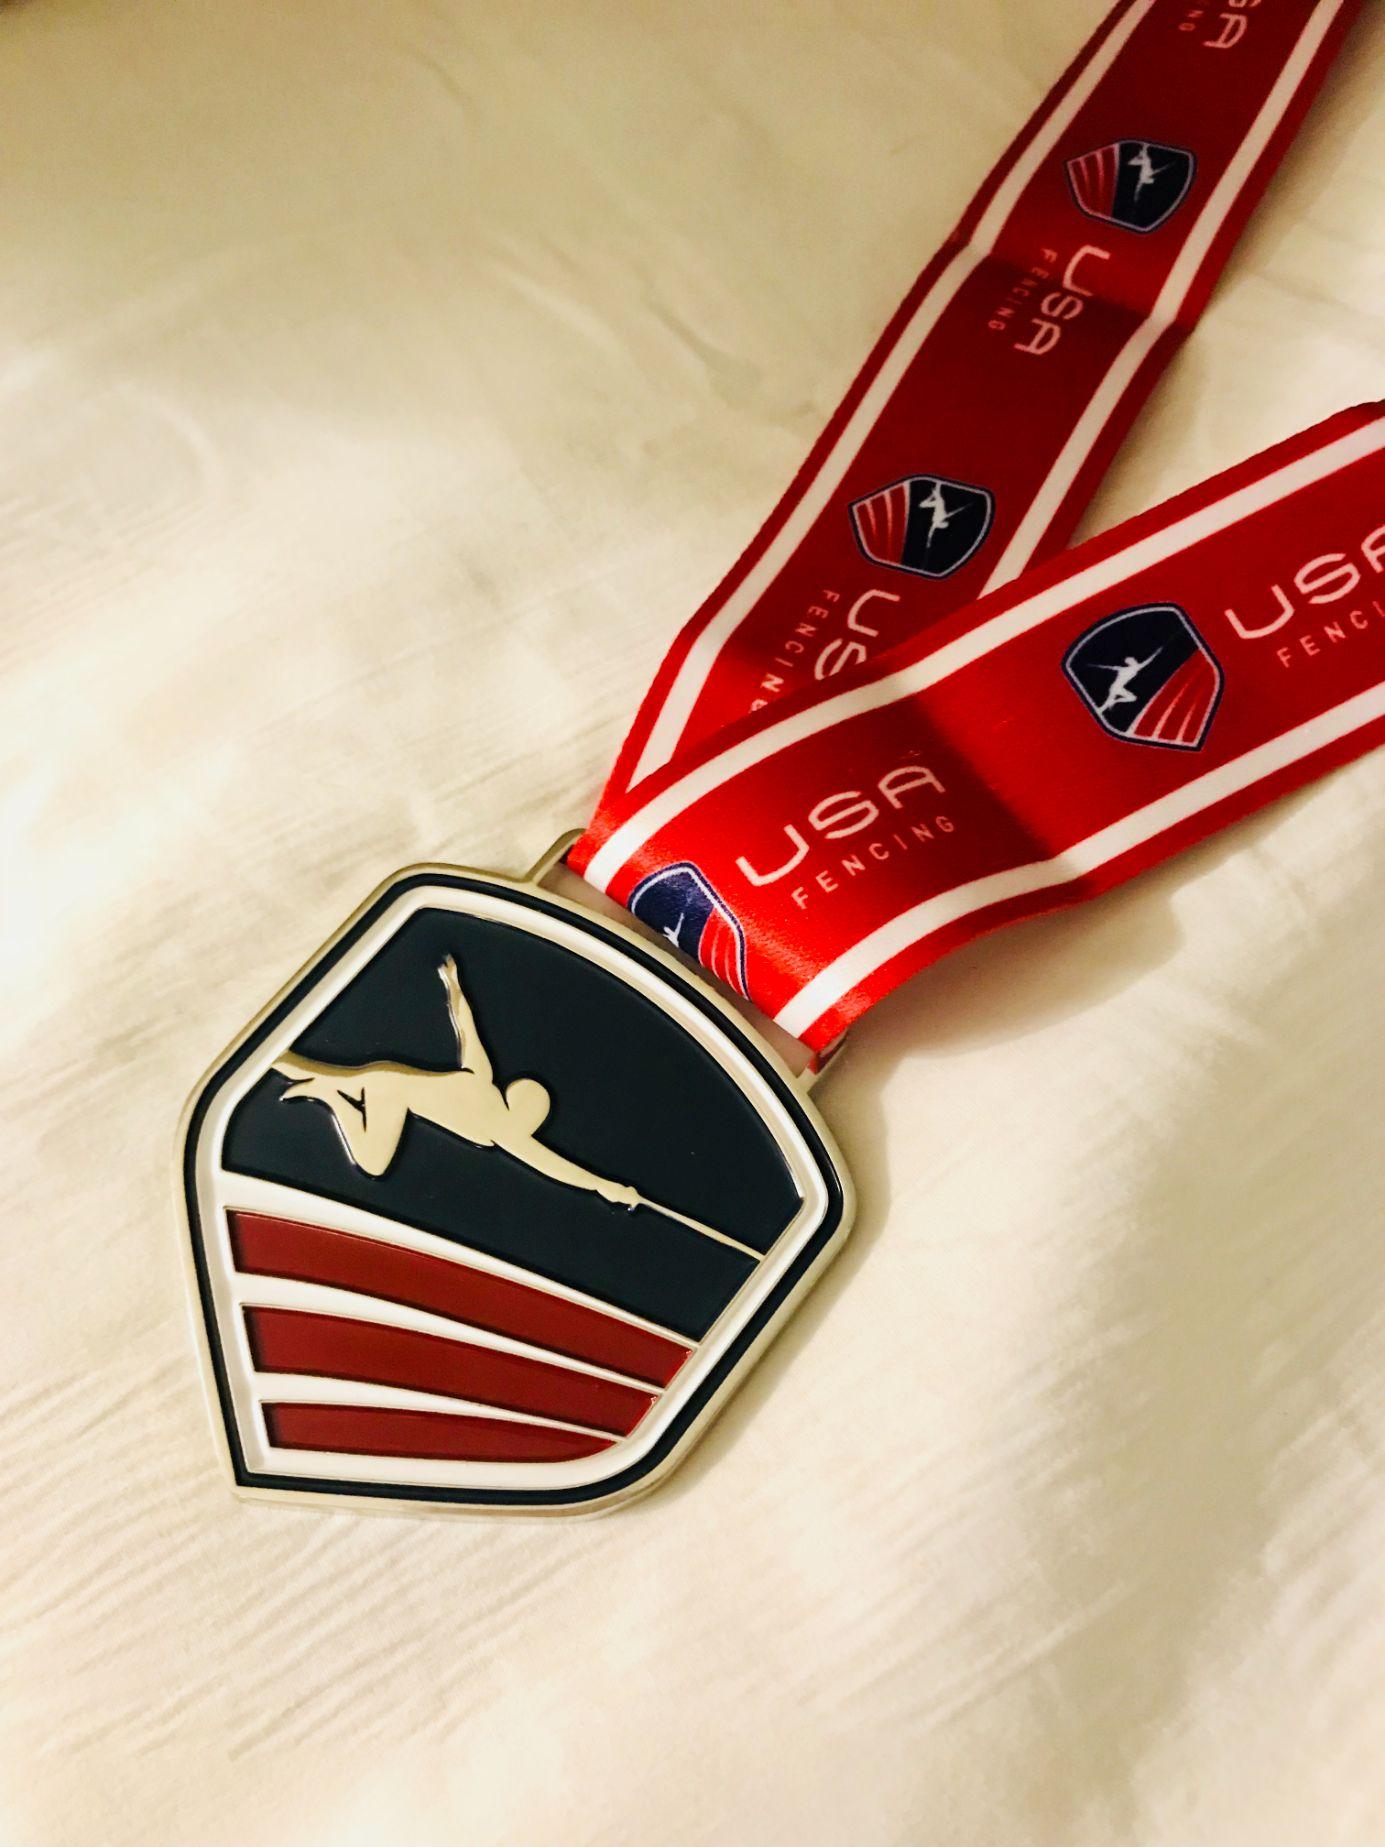 USFA medal